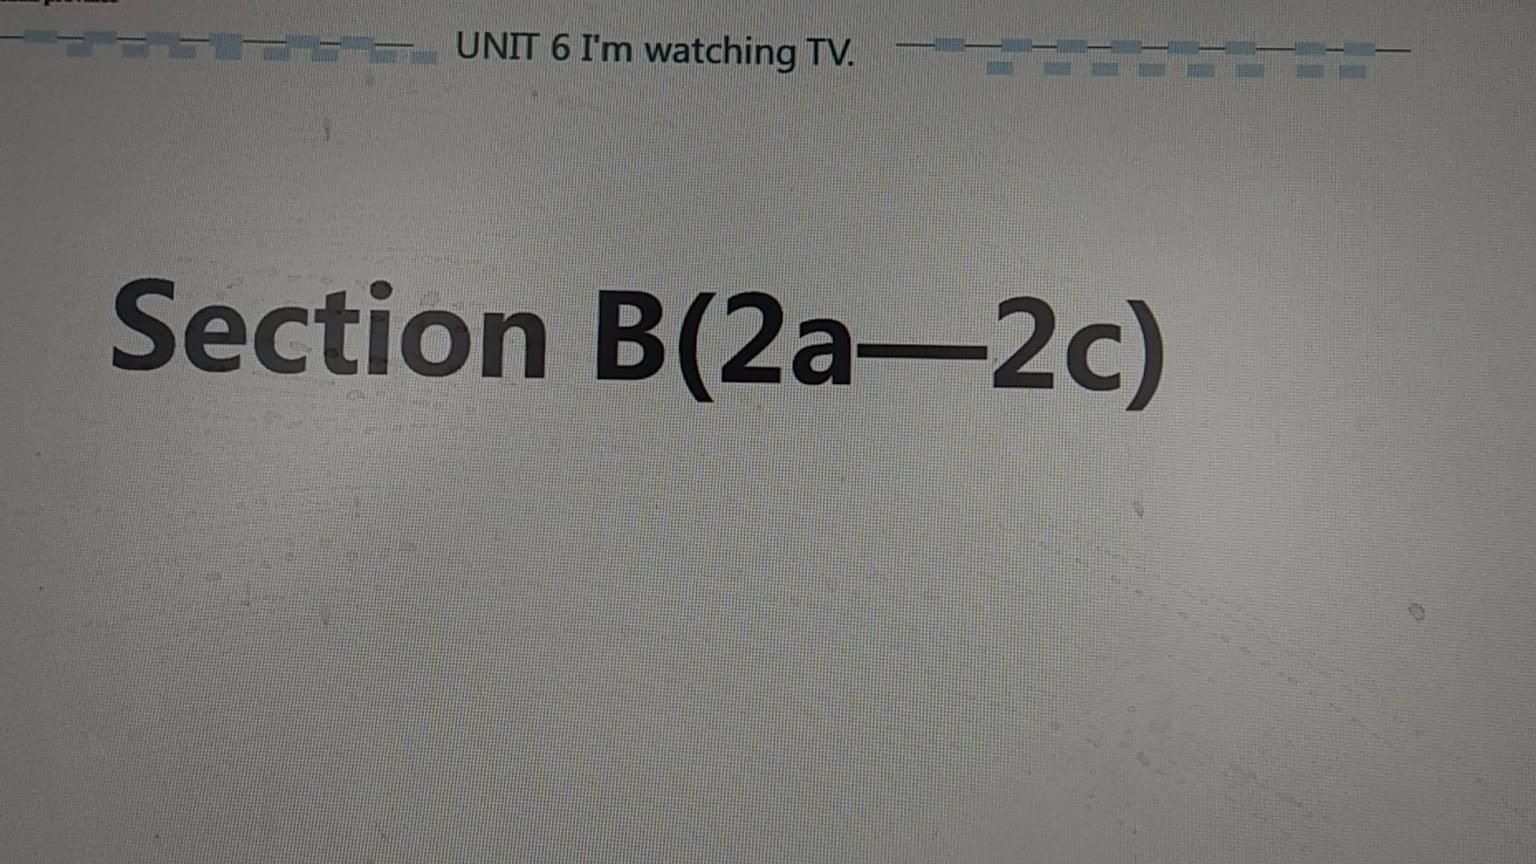 unit6 sectionB